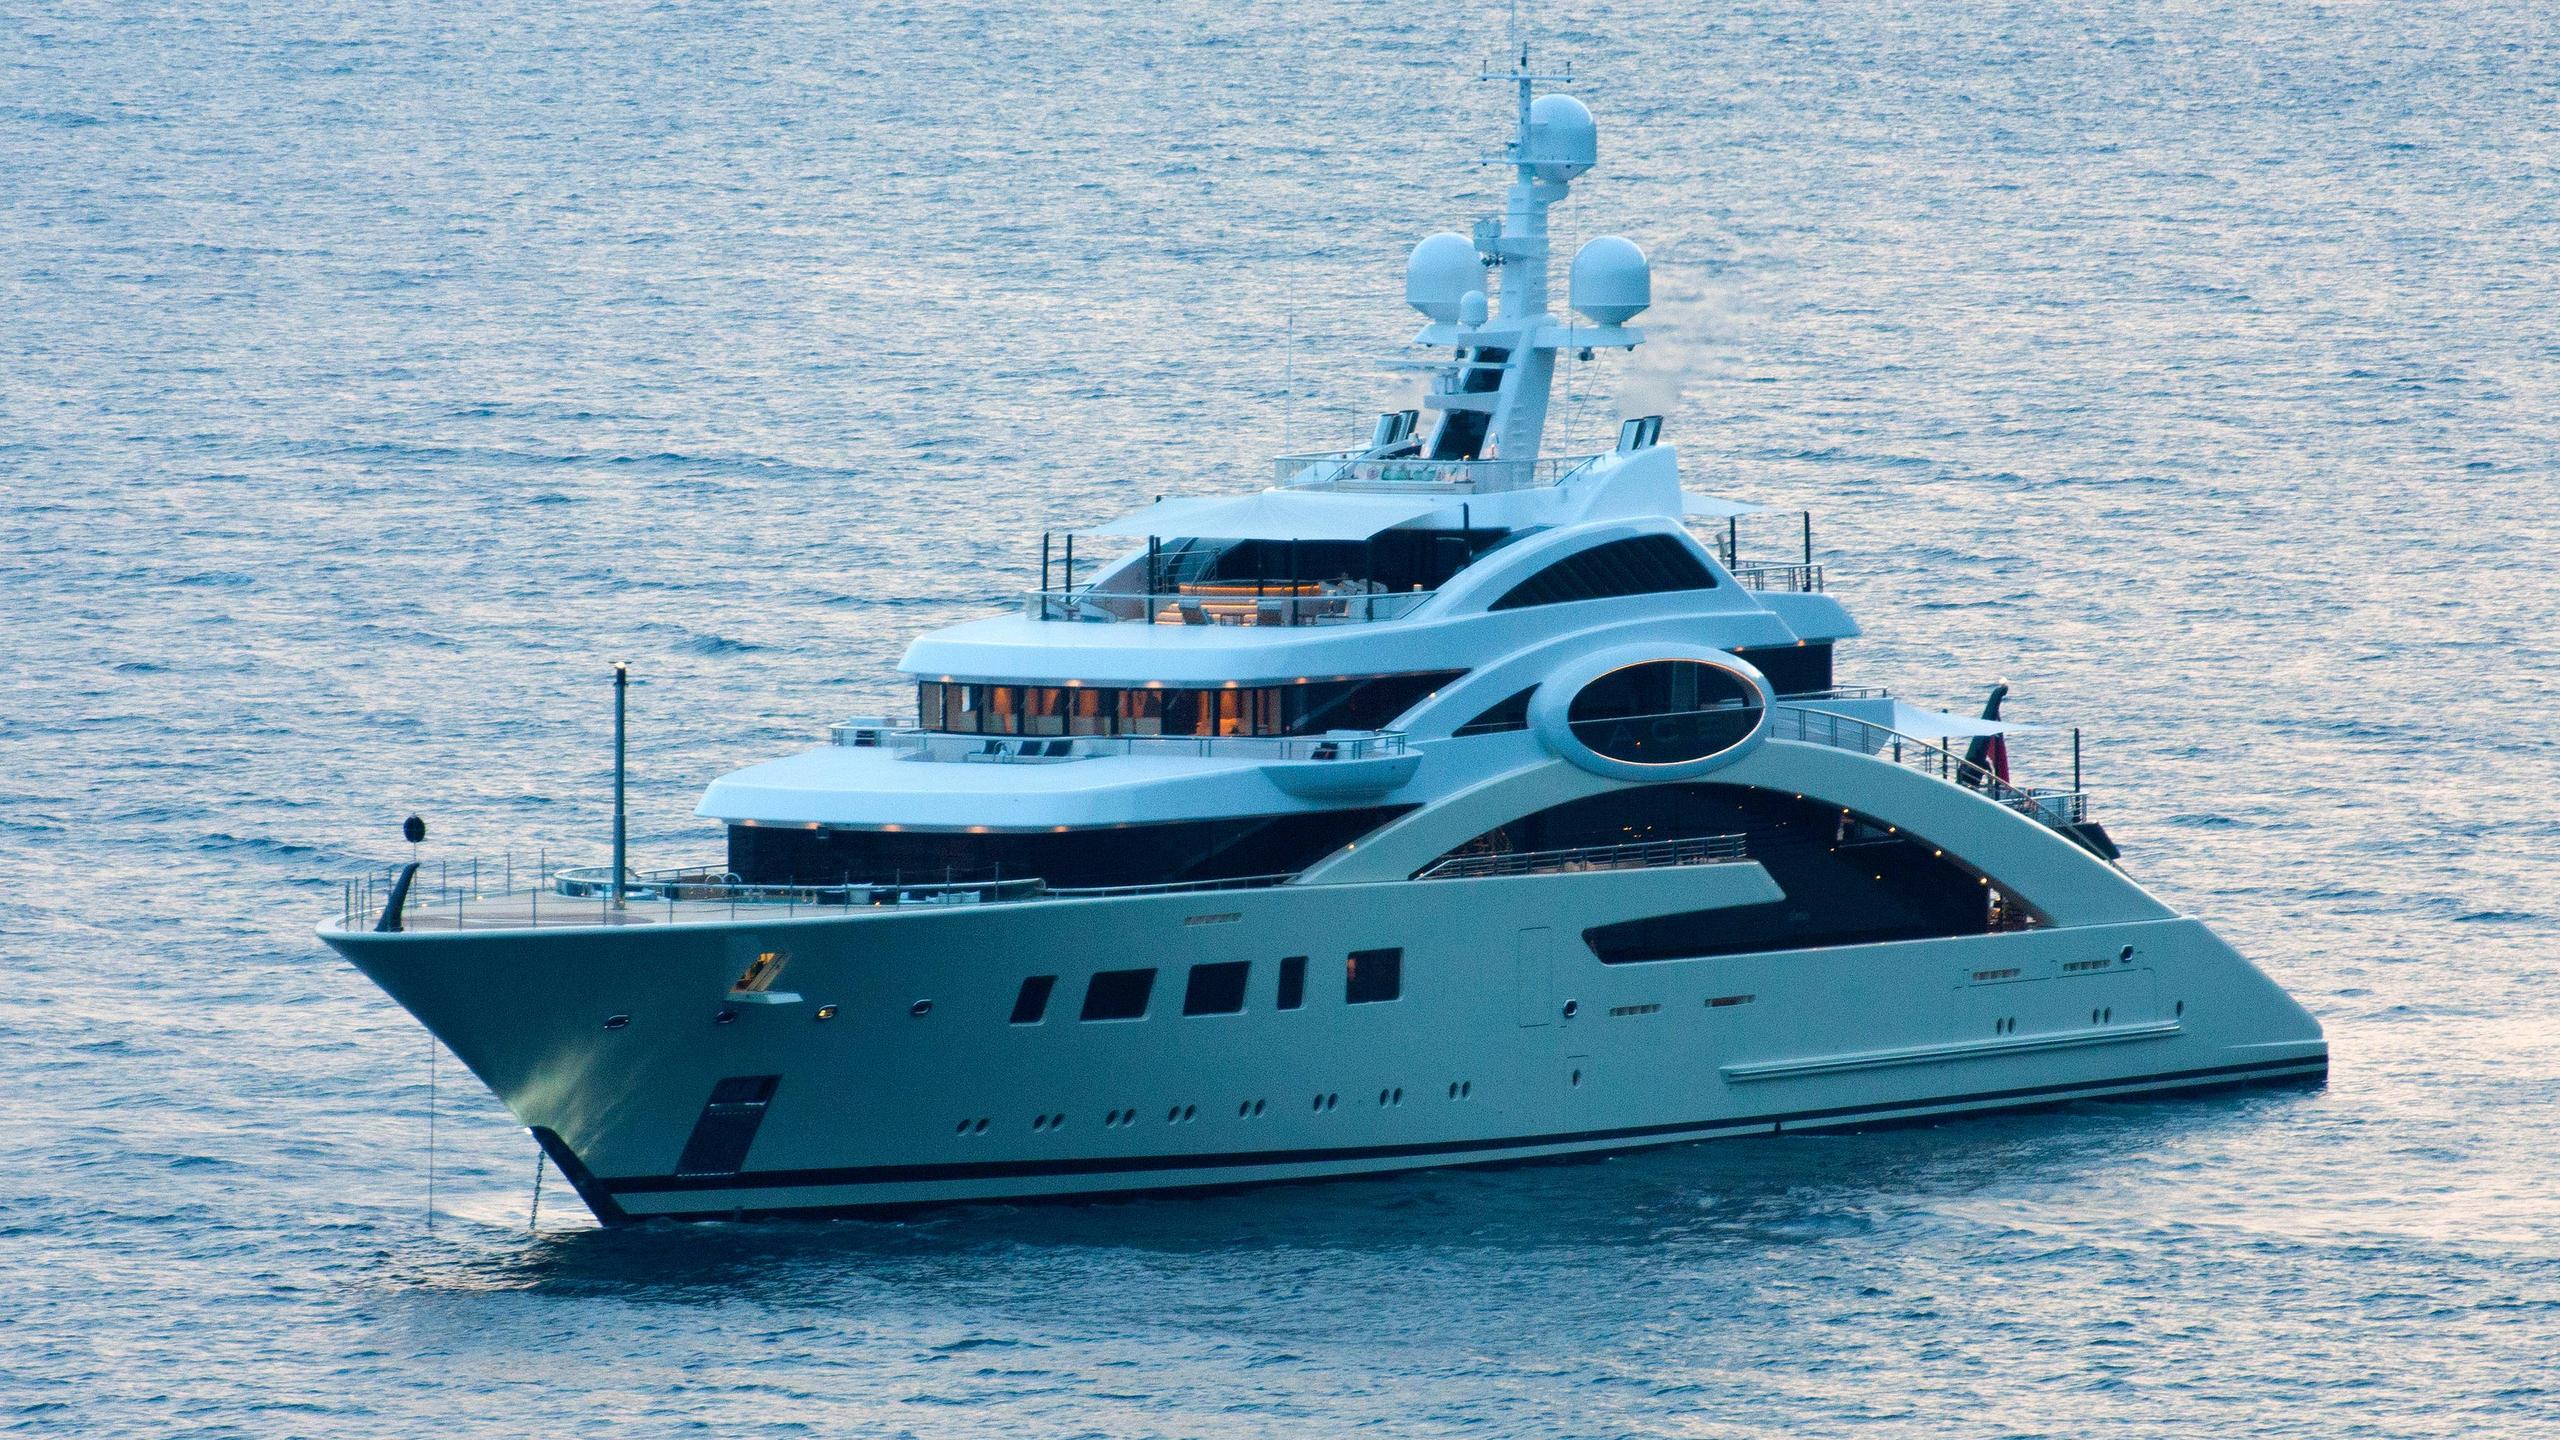 ace-motor-yacht-lurssen-2012-85m-half-profile